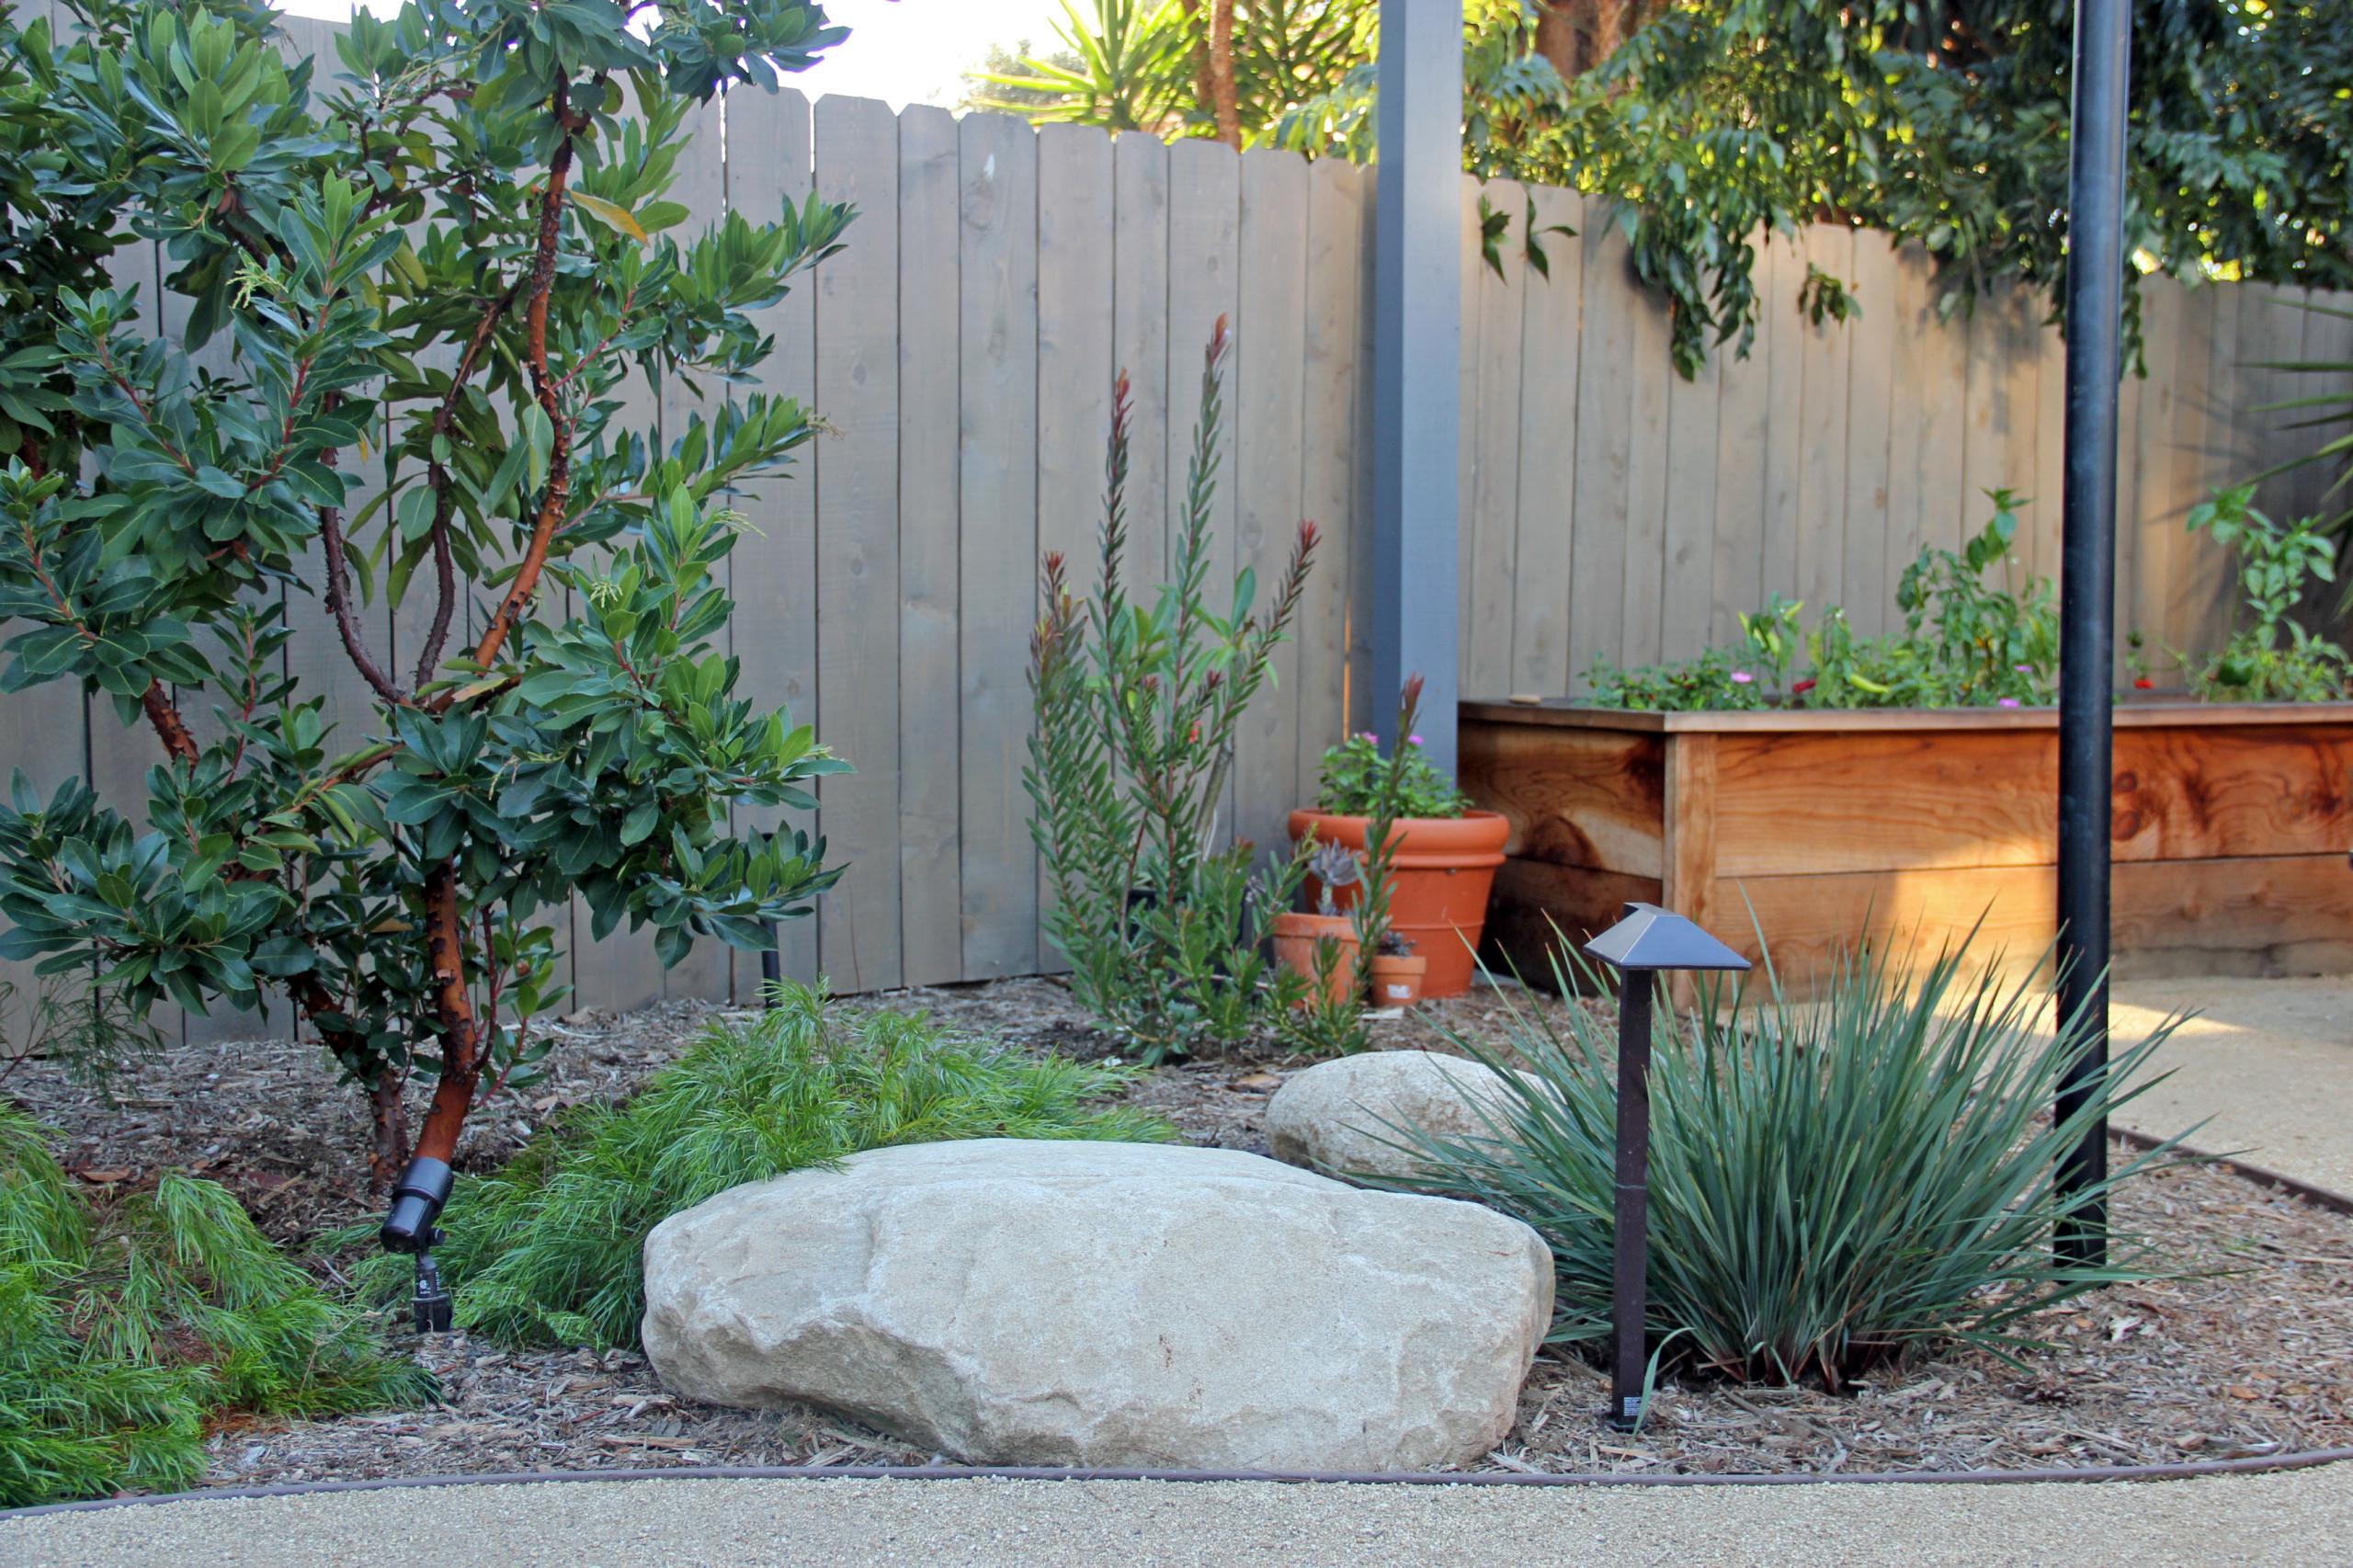 Boulder on Pathway to Vegetable Garden